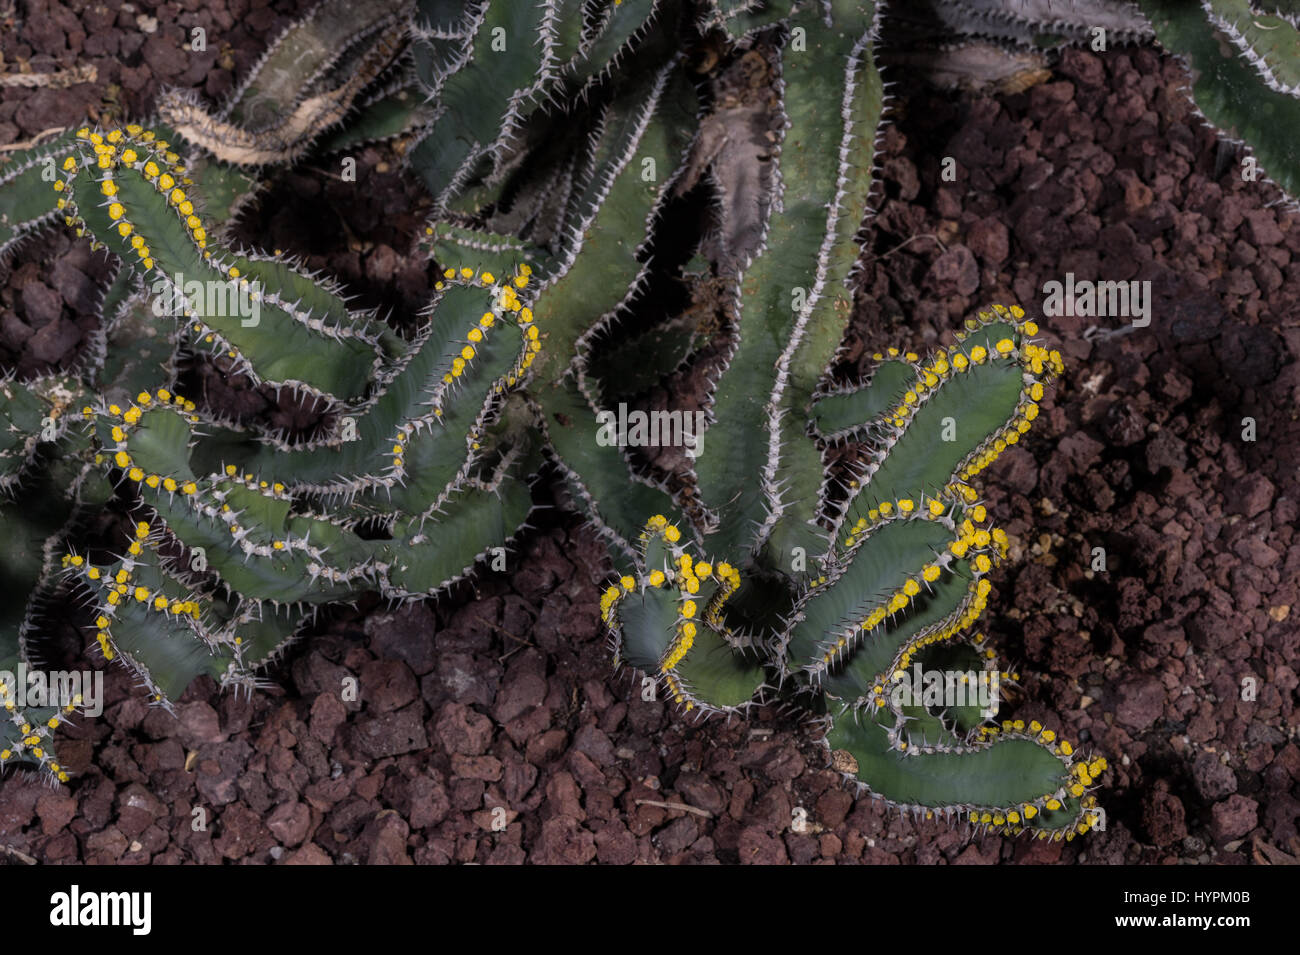 Euphorbia parciramulosa, Euphorbiaceae, endemic to Yemen, Asia - Stock Image